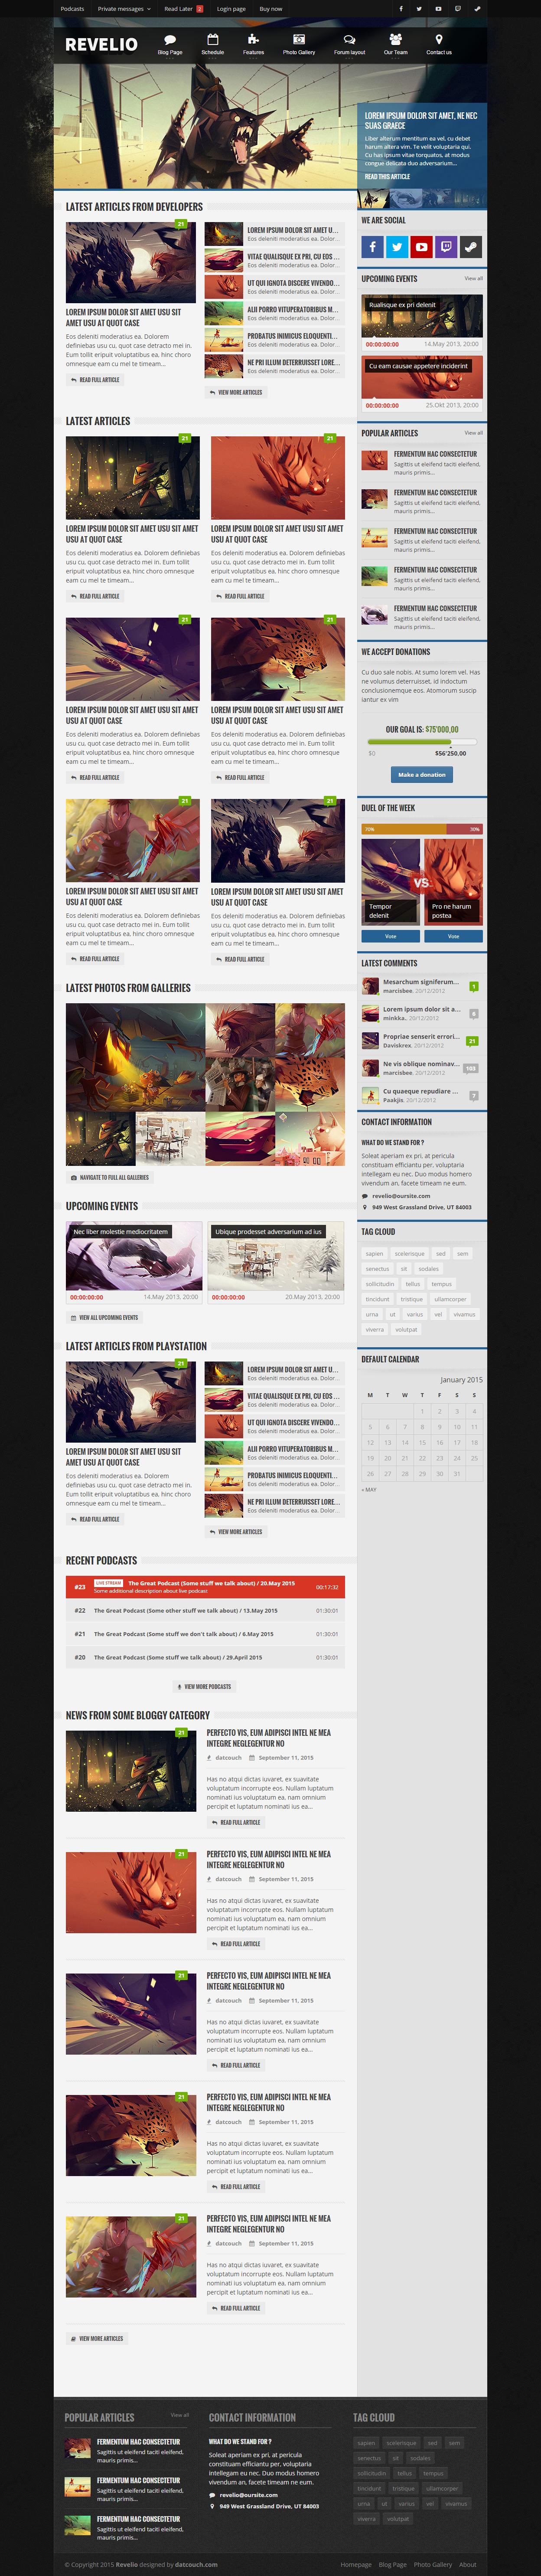 Revelio is Premium Responsive Gaming HTML5 Template. Retina Ready ...